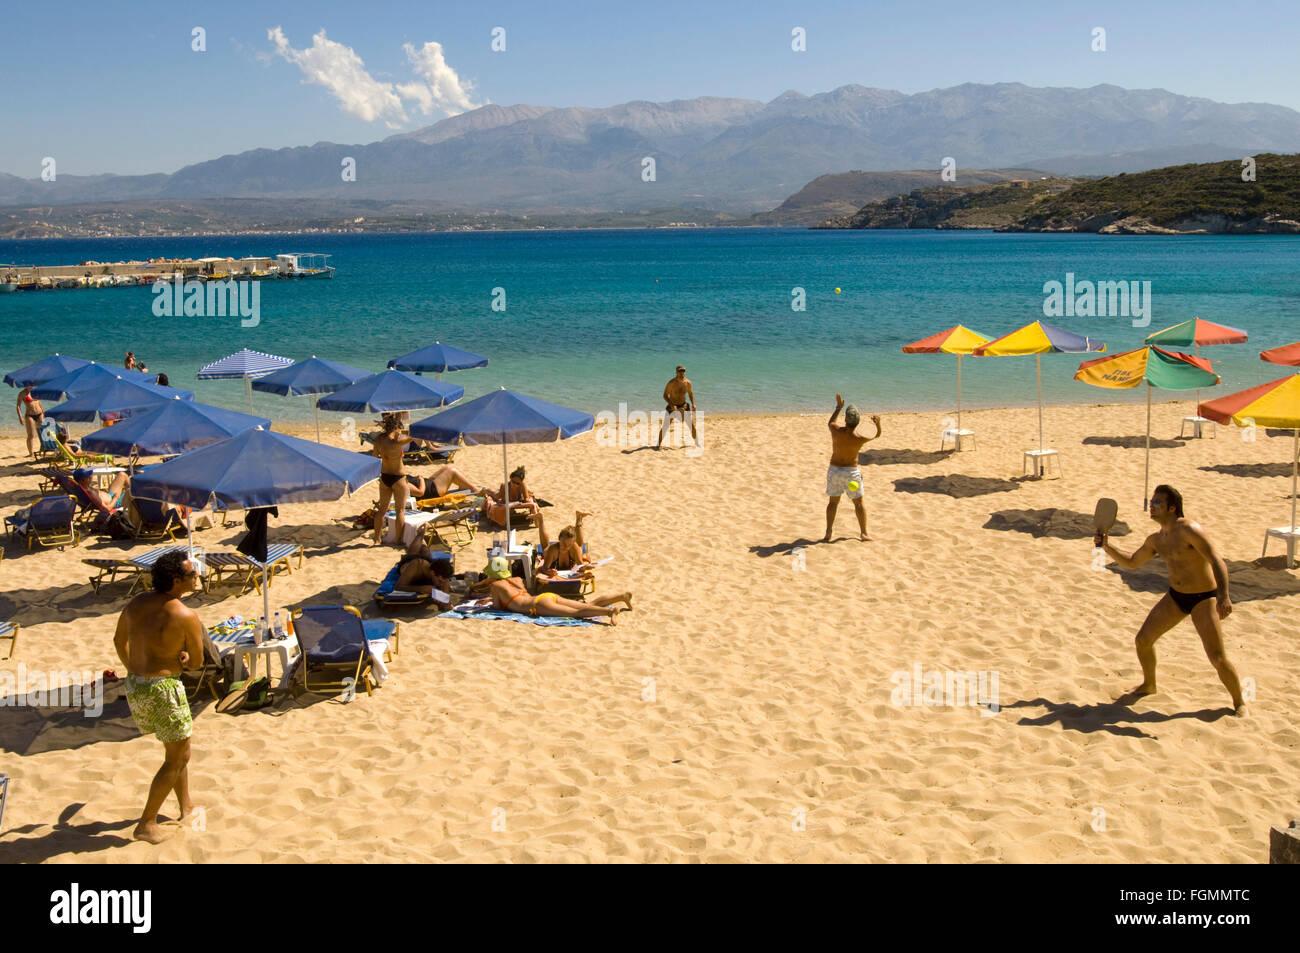 Griechenland, Kreta, bei Chania, Akrotiri-Halbinsel, Marathi, Sandstrand von Marathi - Stock Image